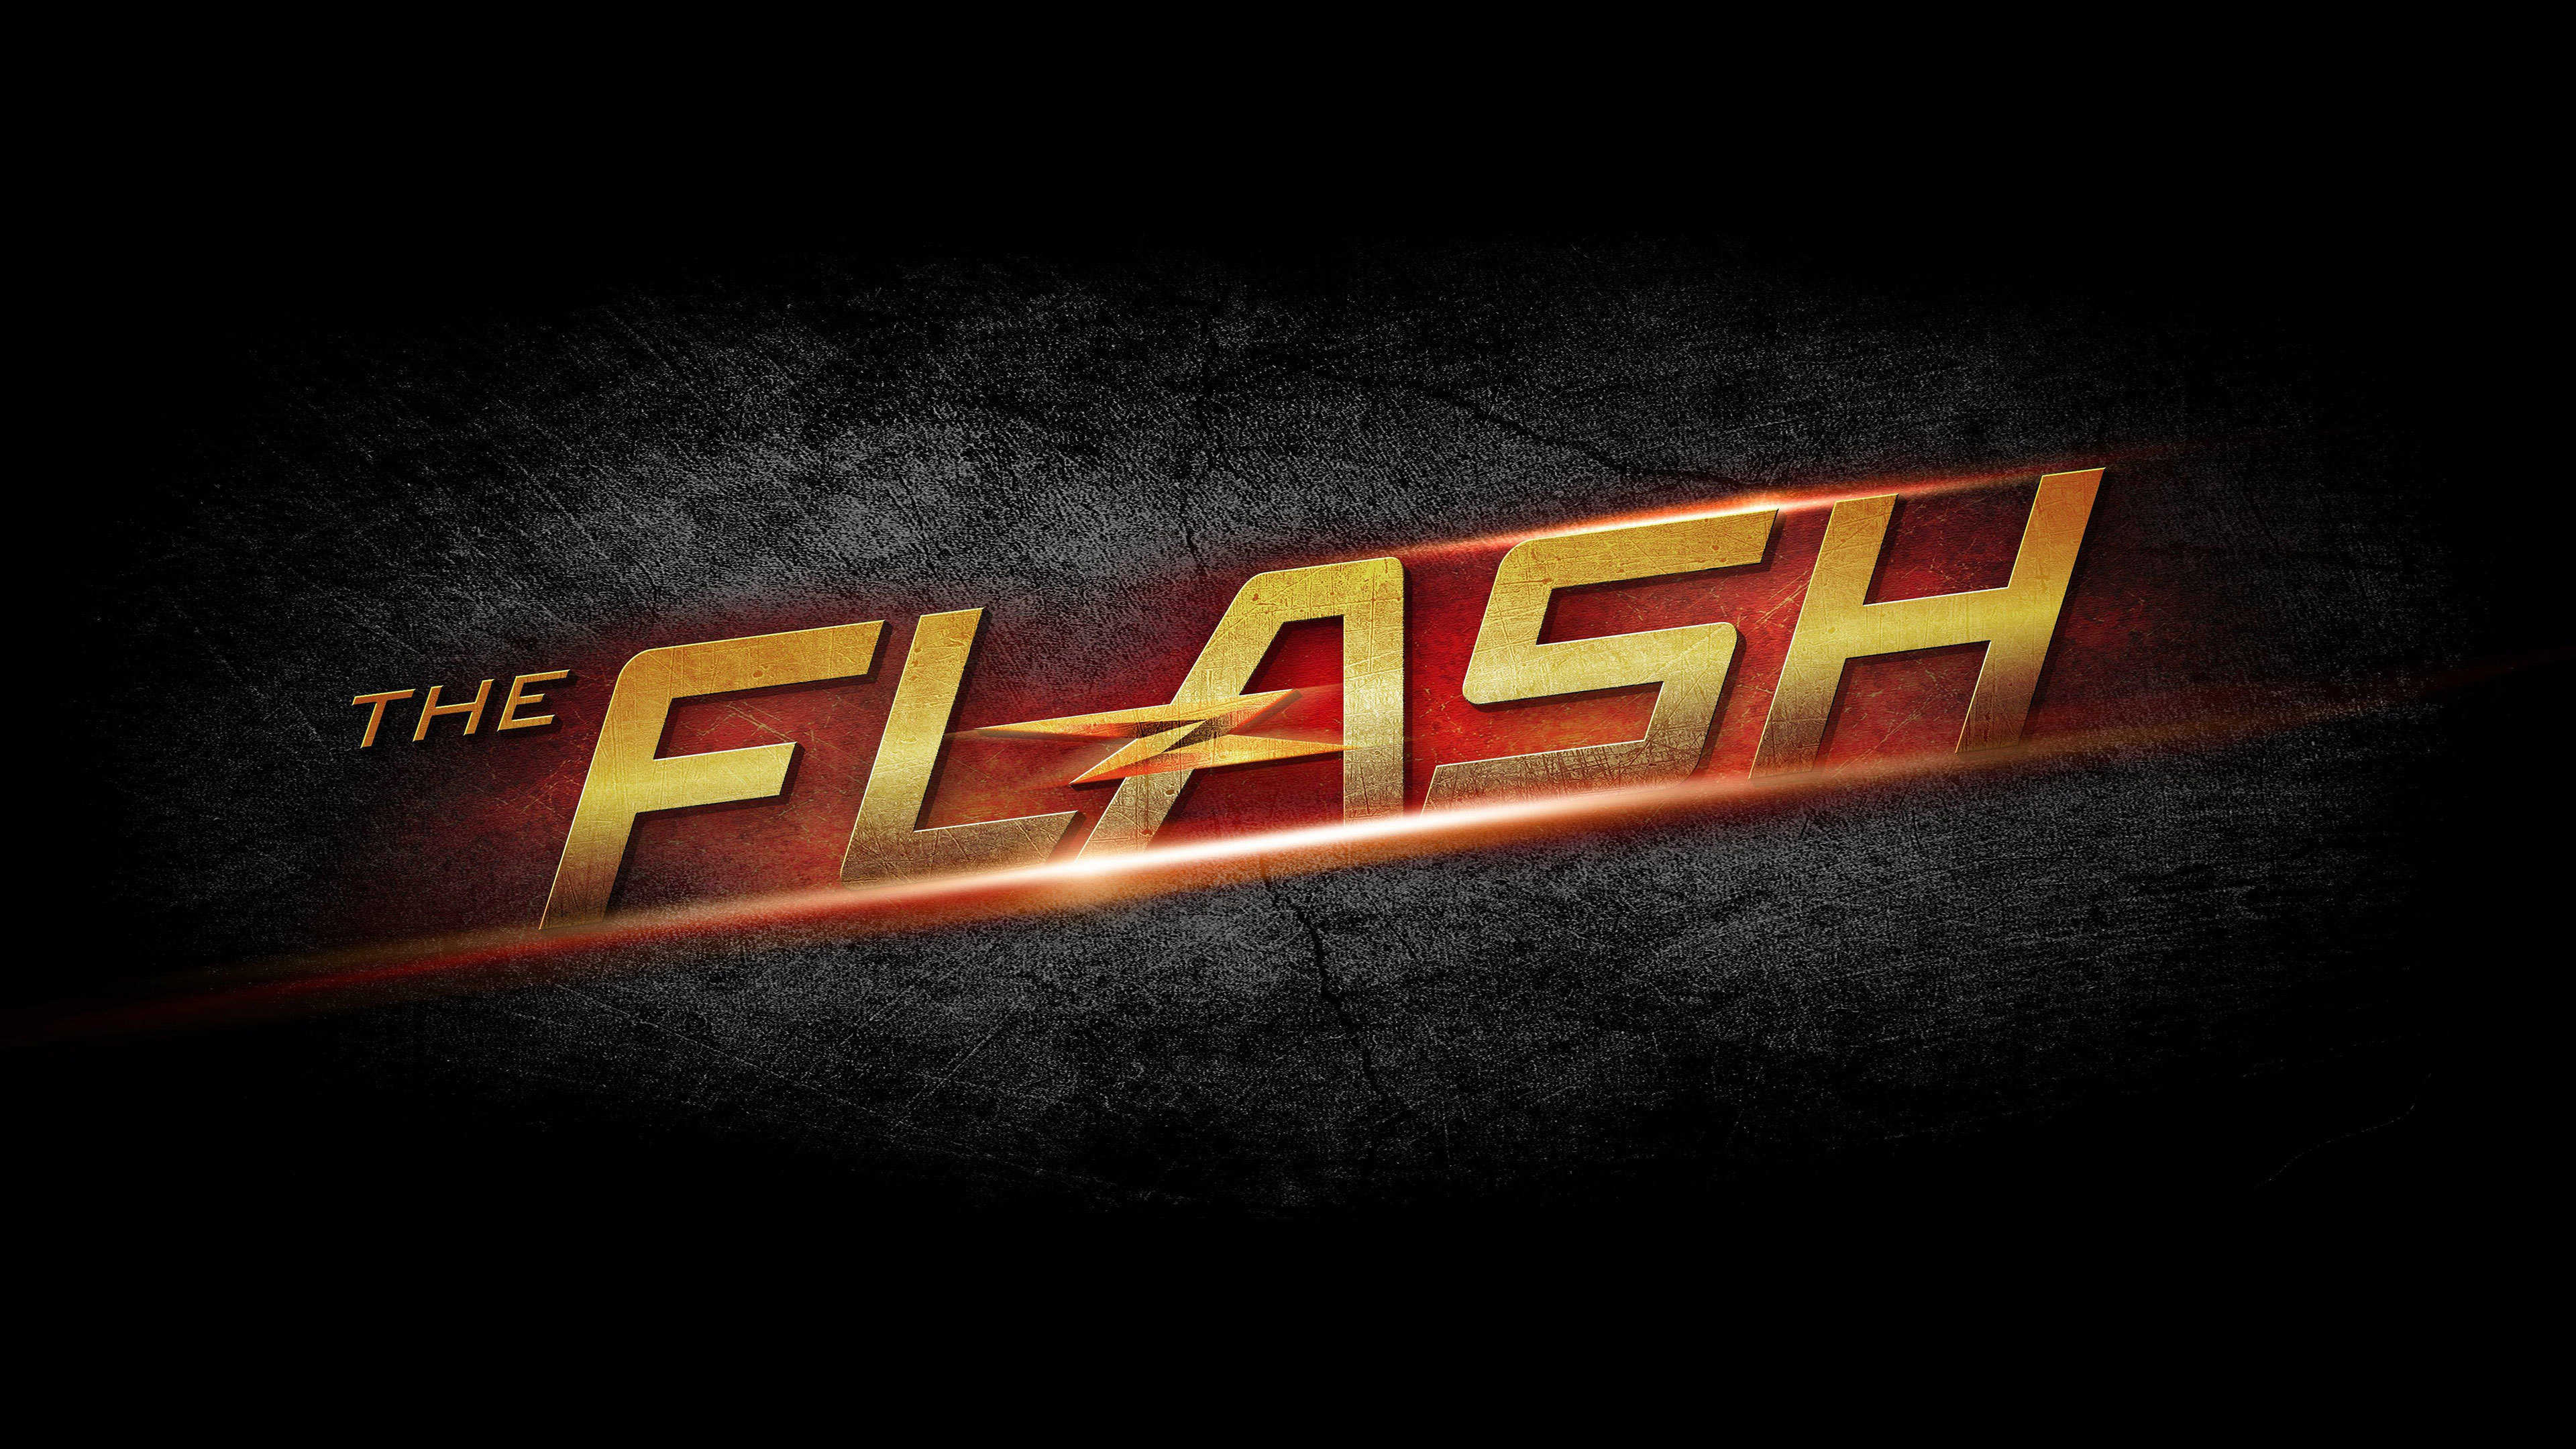 Wallpaper The Flash Logo Desktop Wallpaper Upload at November 1 3840x2160